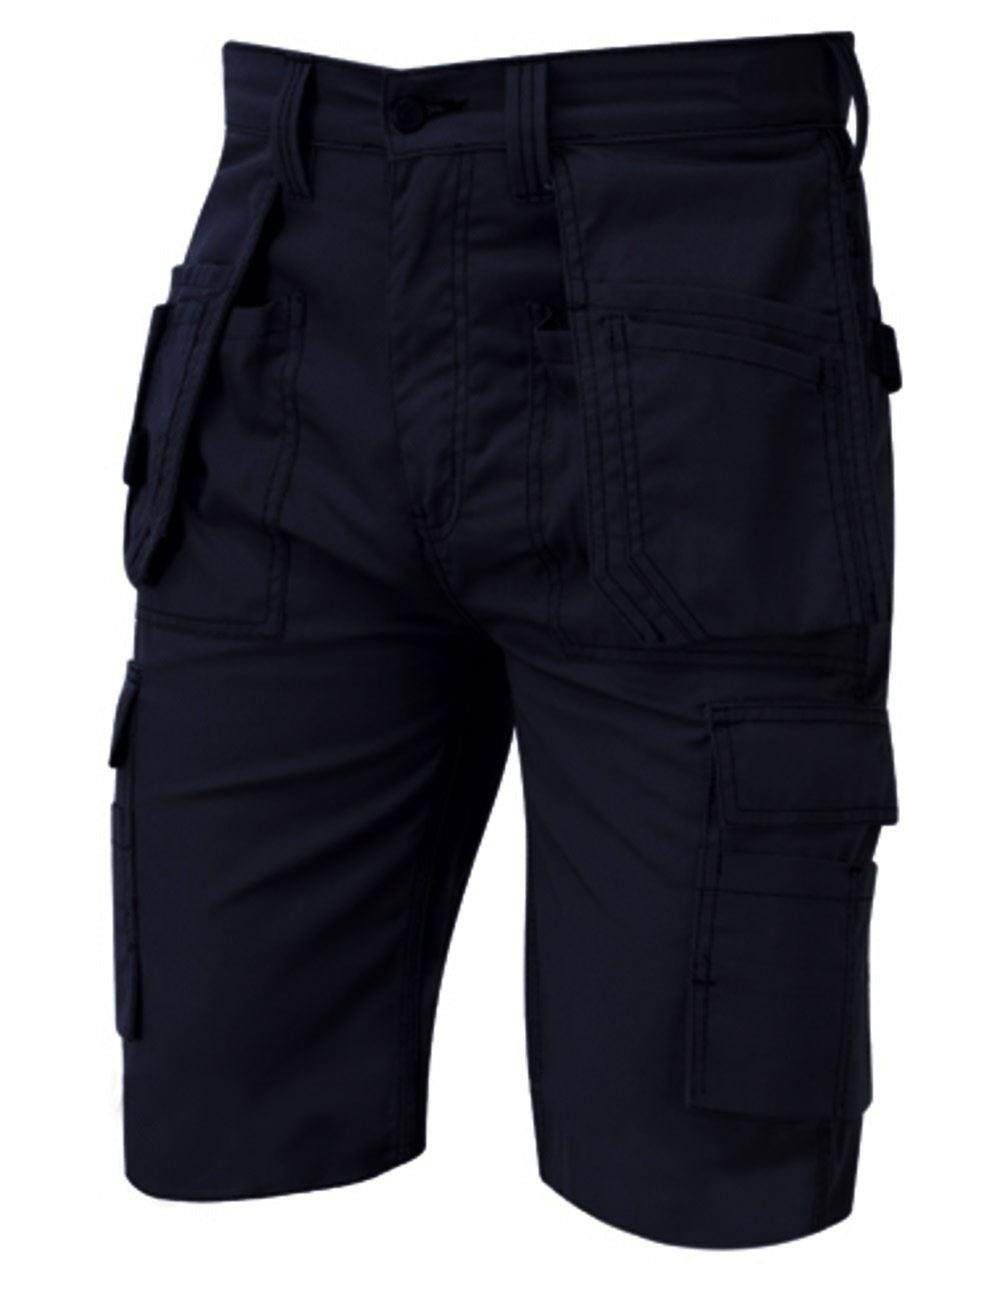 Orn Merlin Tradesman Shorts - Black